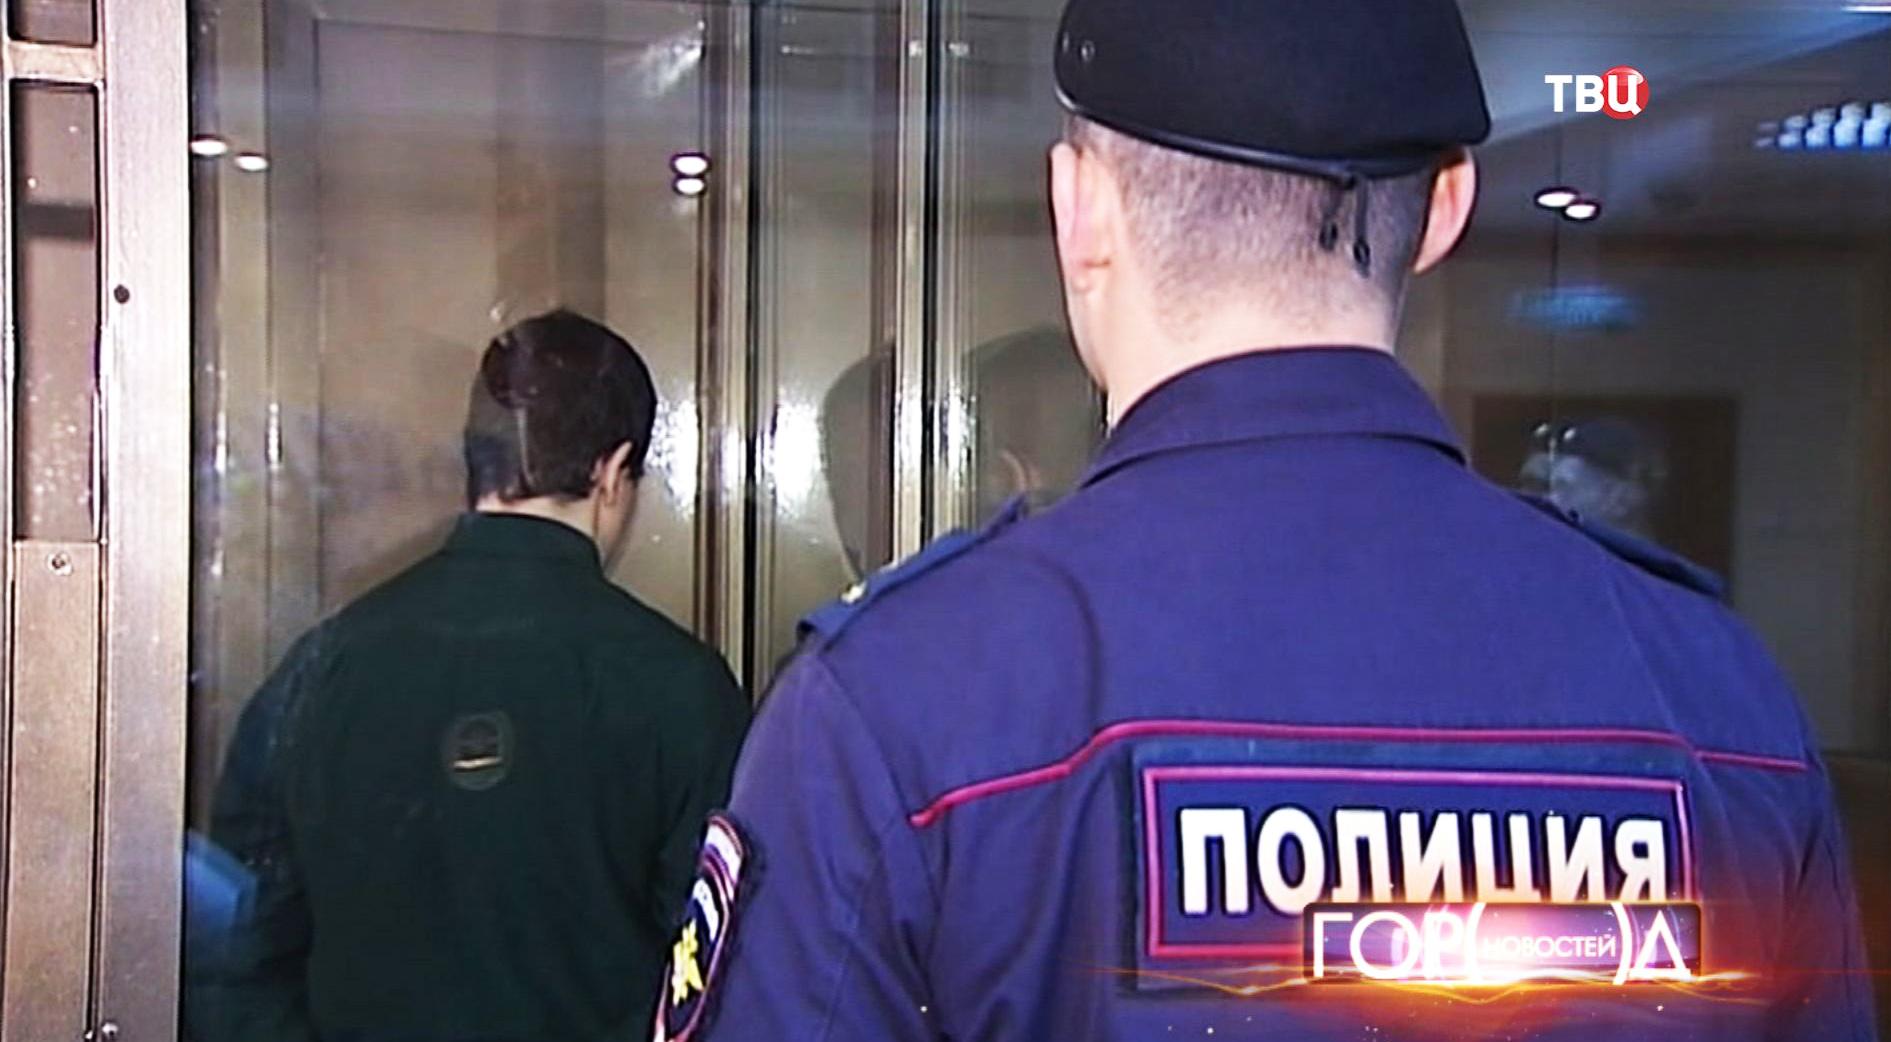 Никита Тихонов в зале суда